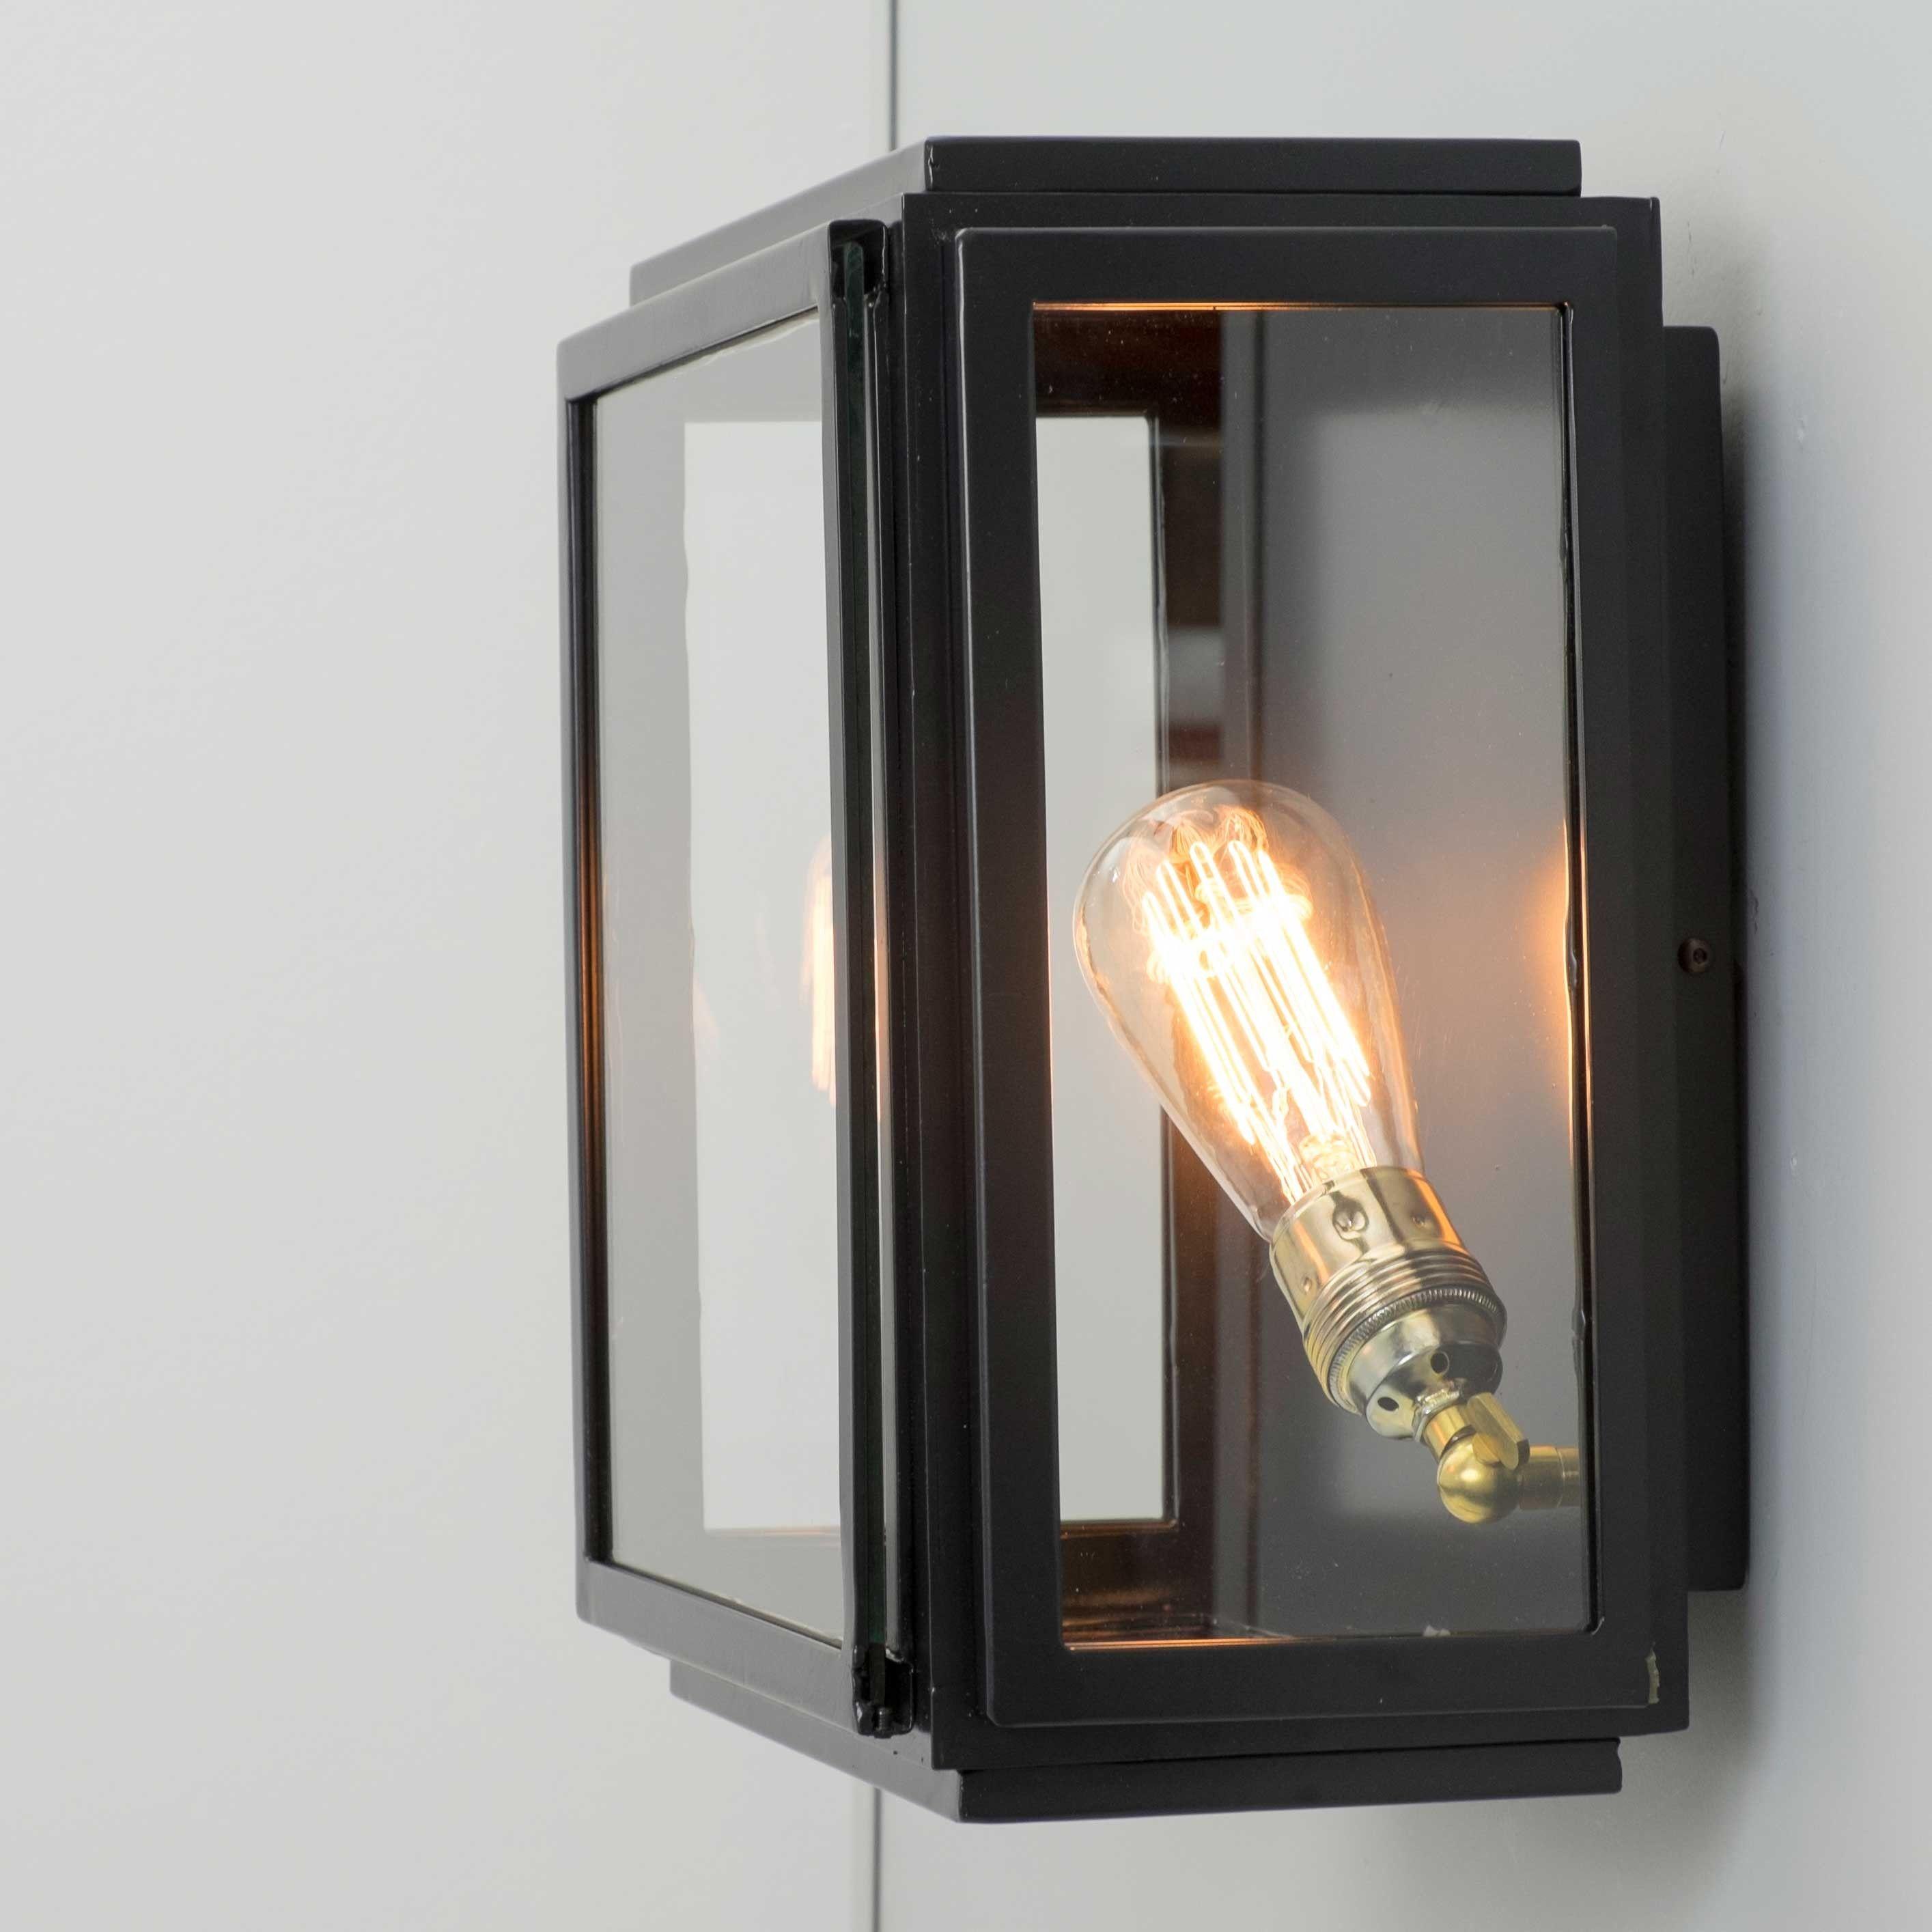 Aplique De Pared Vintage Cuadrado Con Cristal Transparente Dorcas Iluminacion De Pared Apliques De Pared Paredes Iluminadas